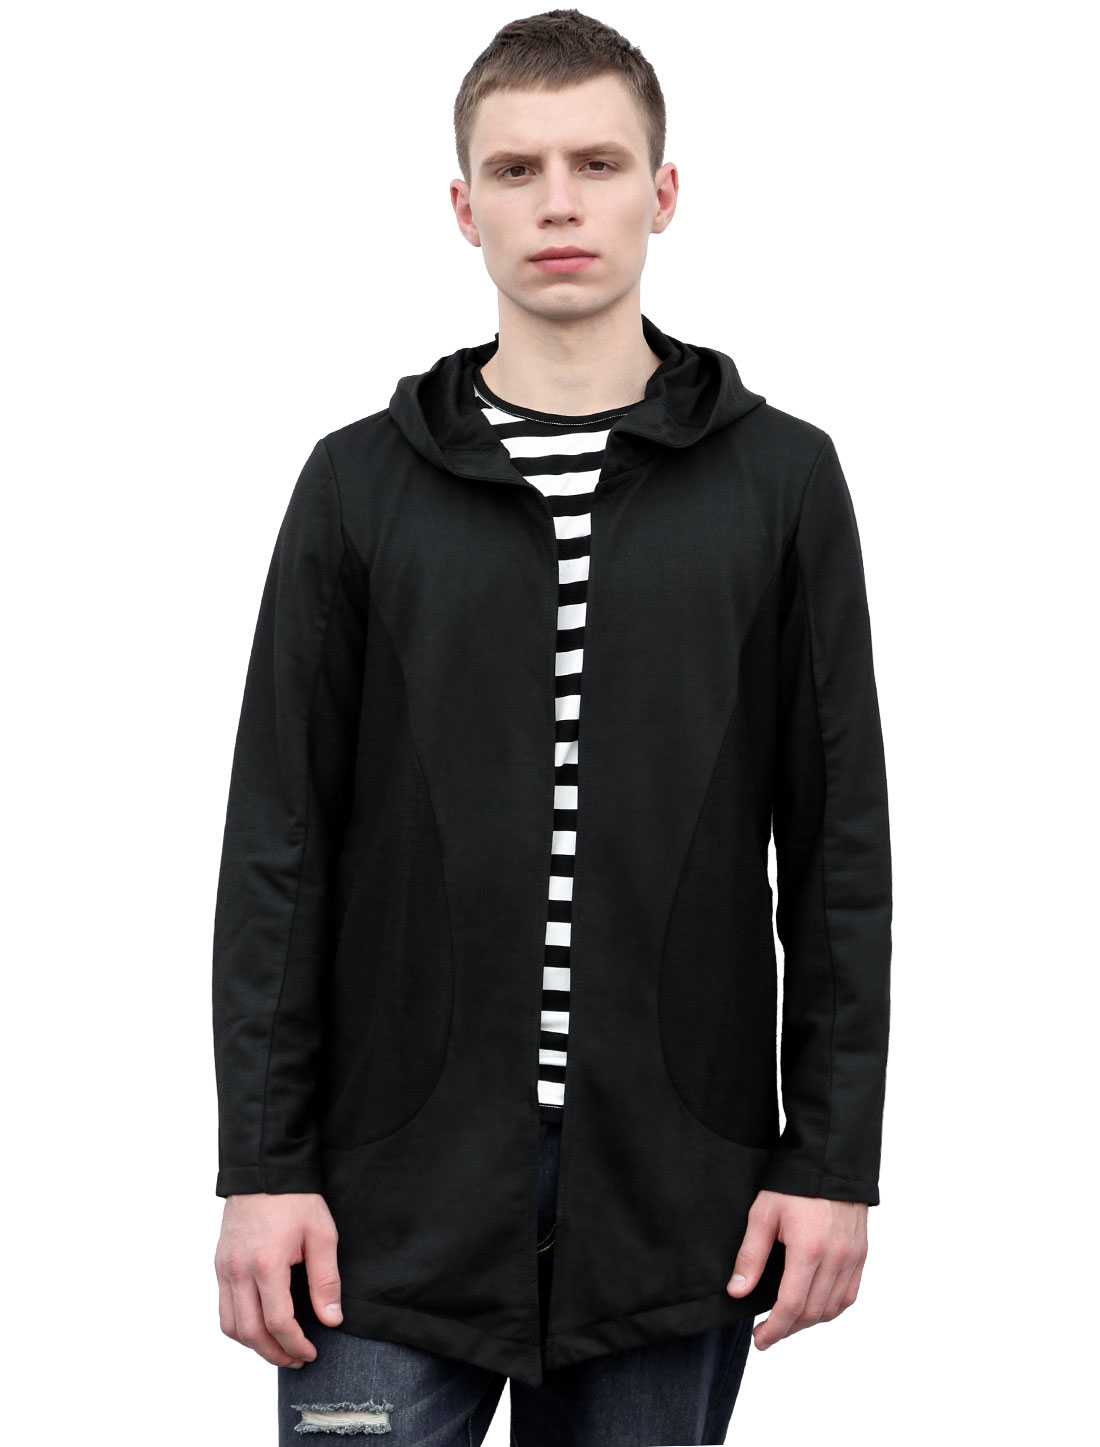 Men Long Sleeves Front Opening Longline Hooded Cardigan